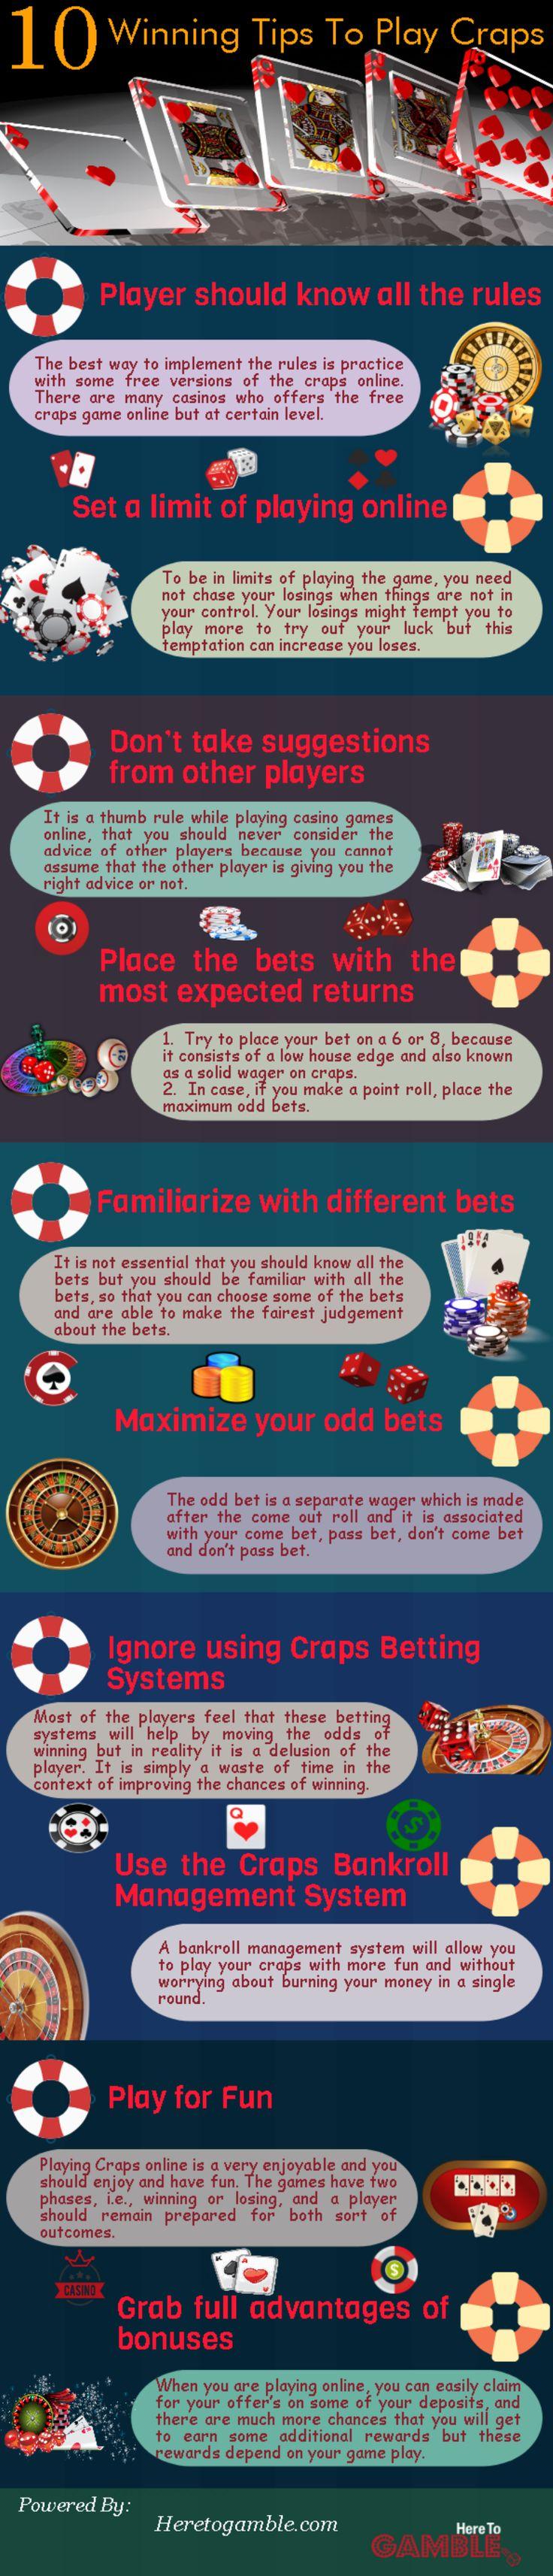 Explore the magic of winning craps online - Learn Top 10 #Winning Tips to play #Craps #Online